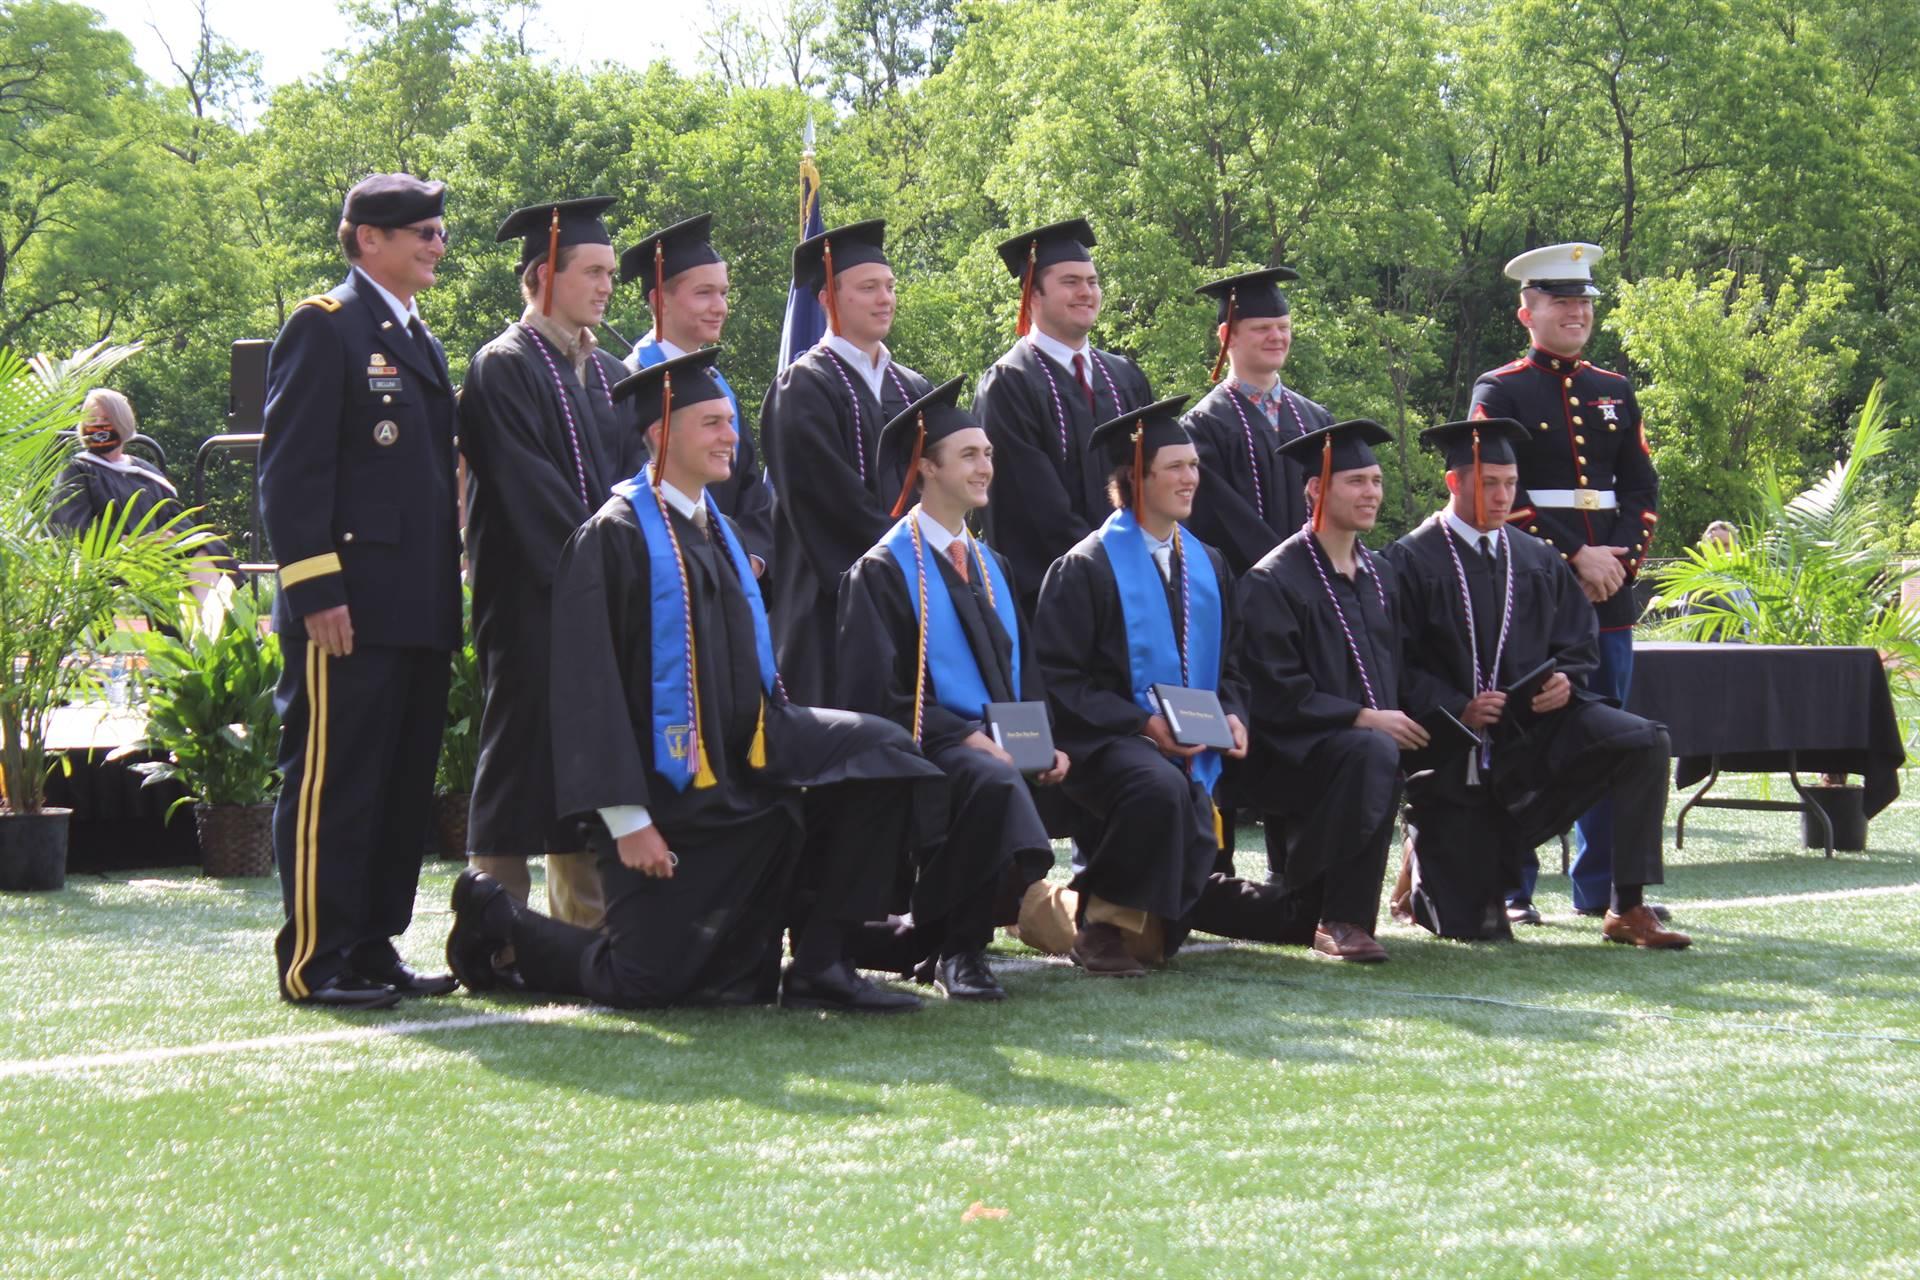 the 10 military graduates